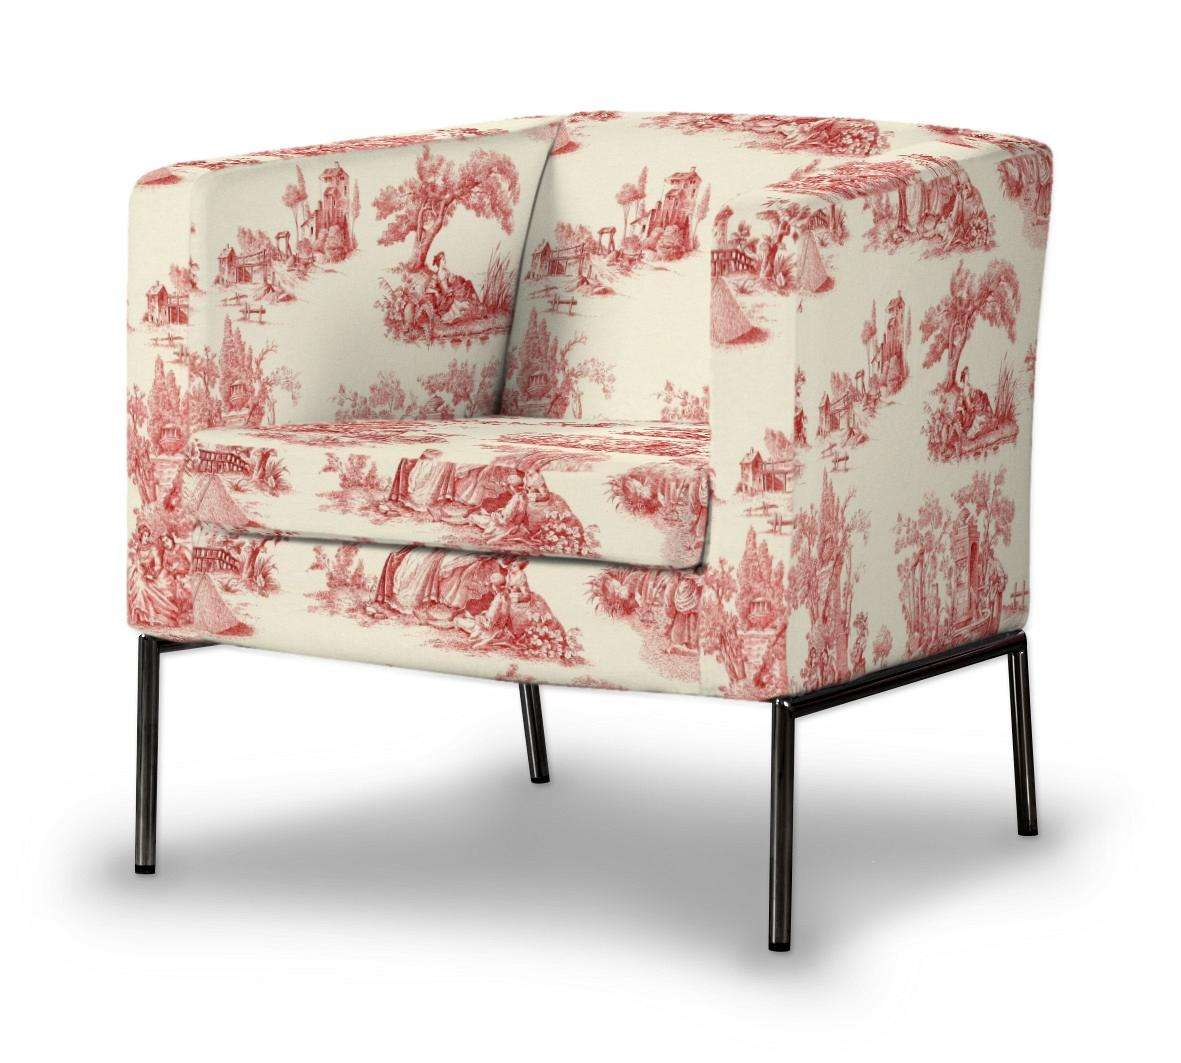 Groovy Klappsta Armchair Cover Inzonedesignstudio Interior Chair Design Inzonedesignstudiocom